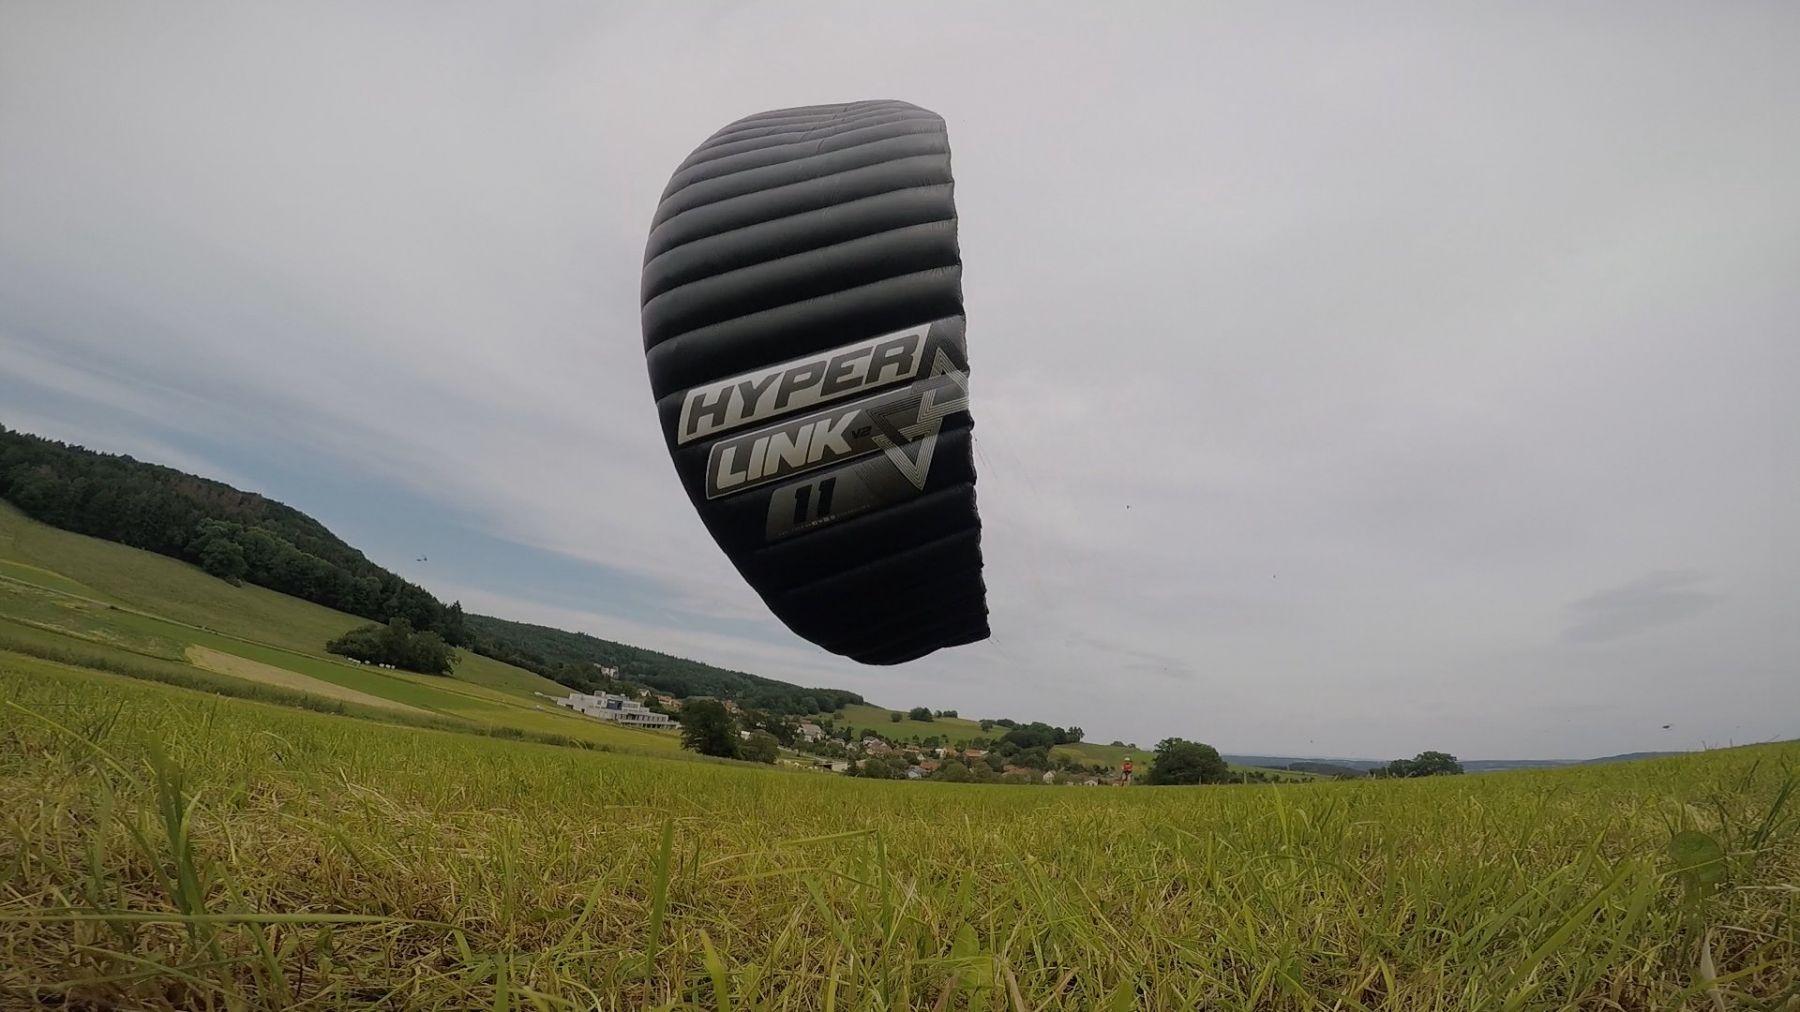 HyperlinkV2_Ozonekites_Kitesurfing_Snowkiting_Snowkite_Odenwald